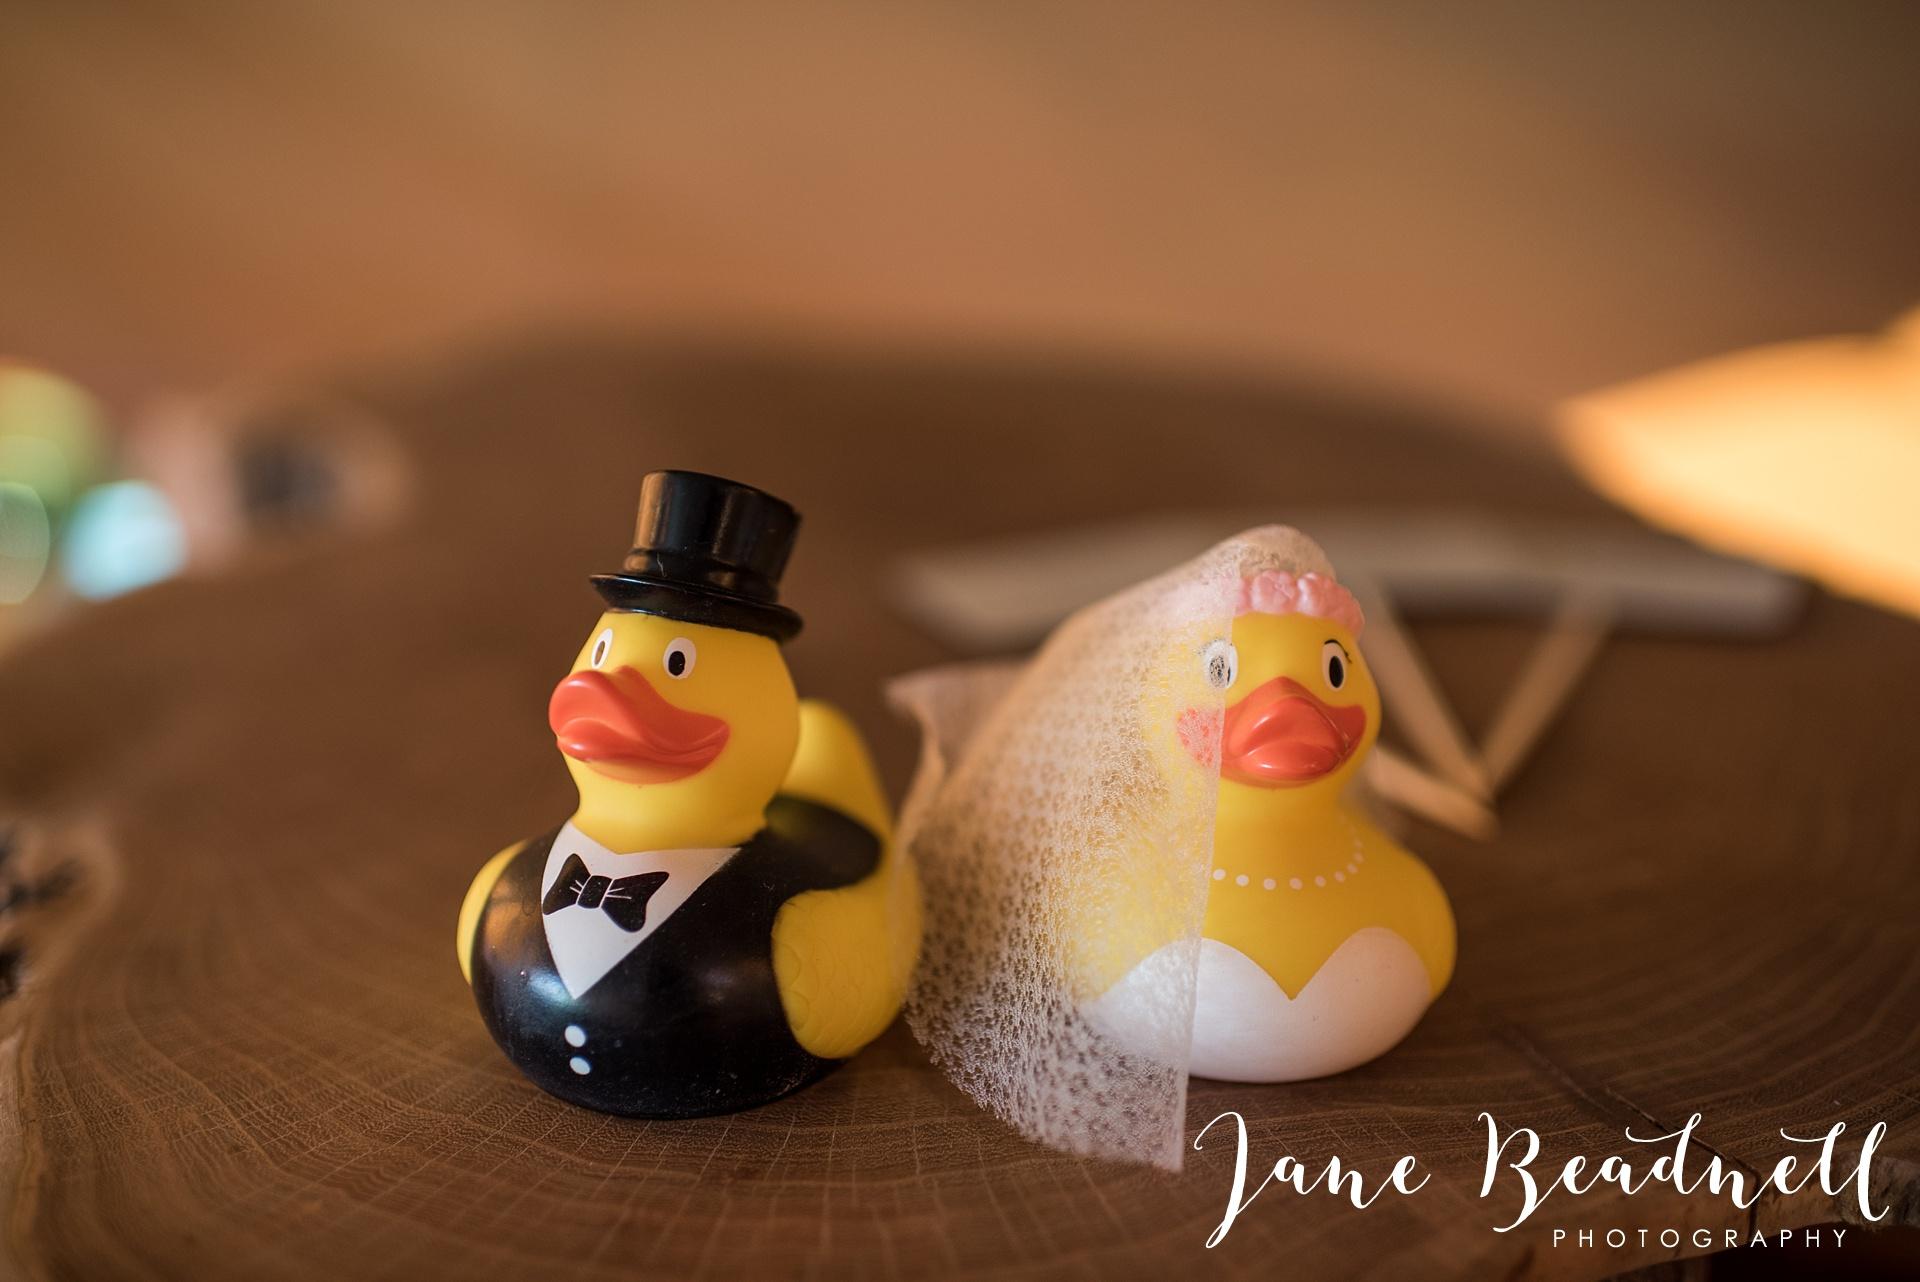 fine-art-wedding-photographer-jane-beadnell-yorkshire-wedding-photographer_0097